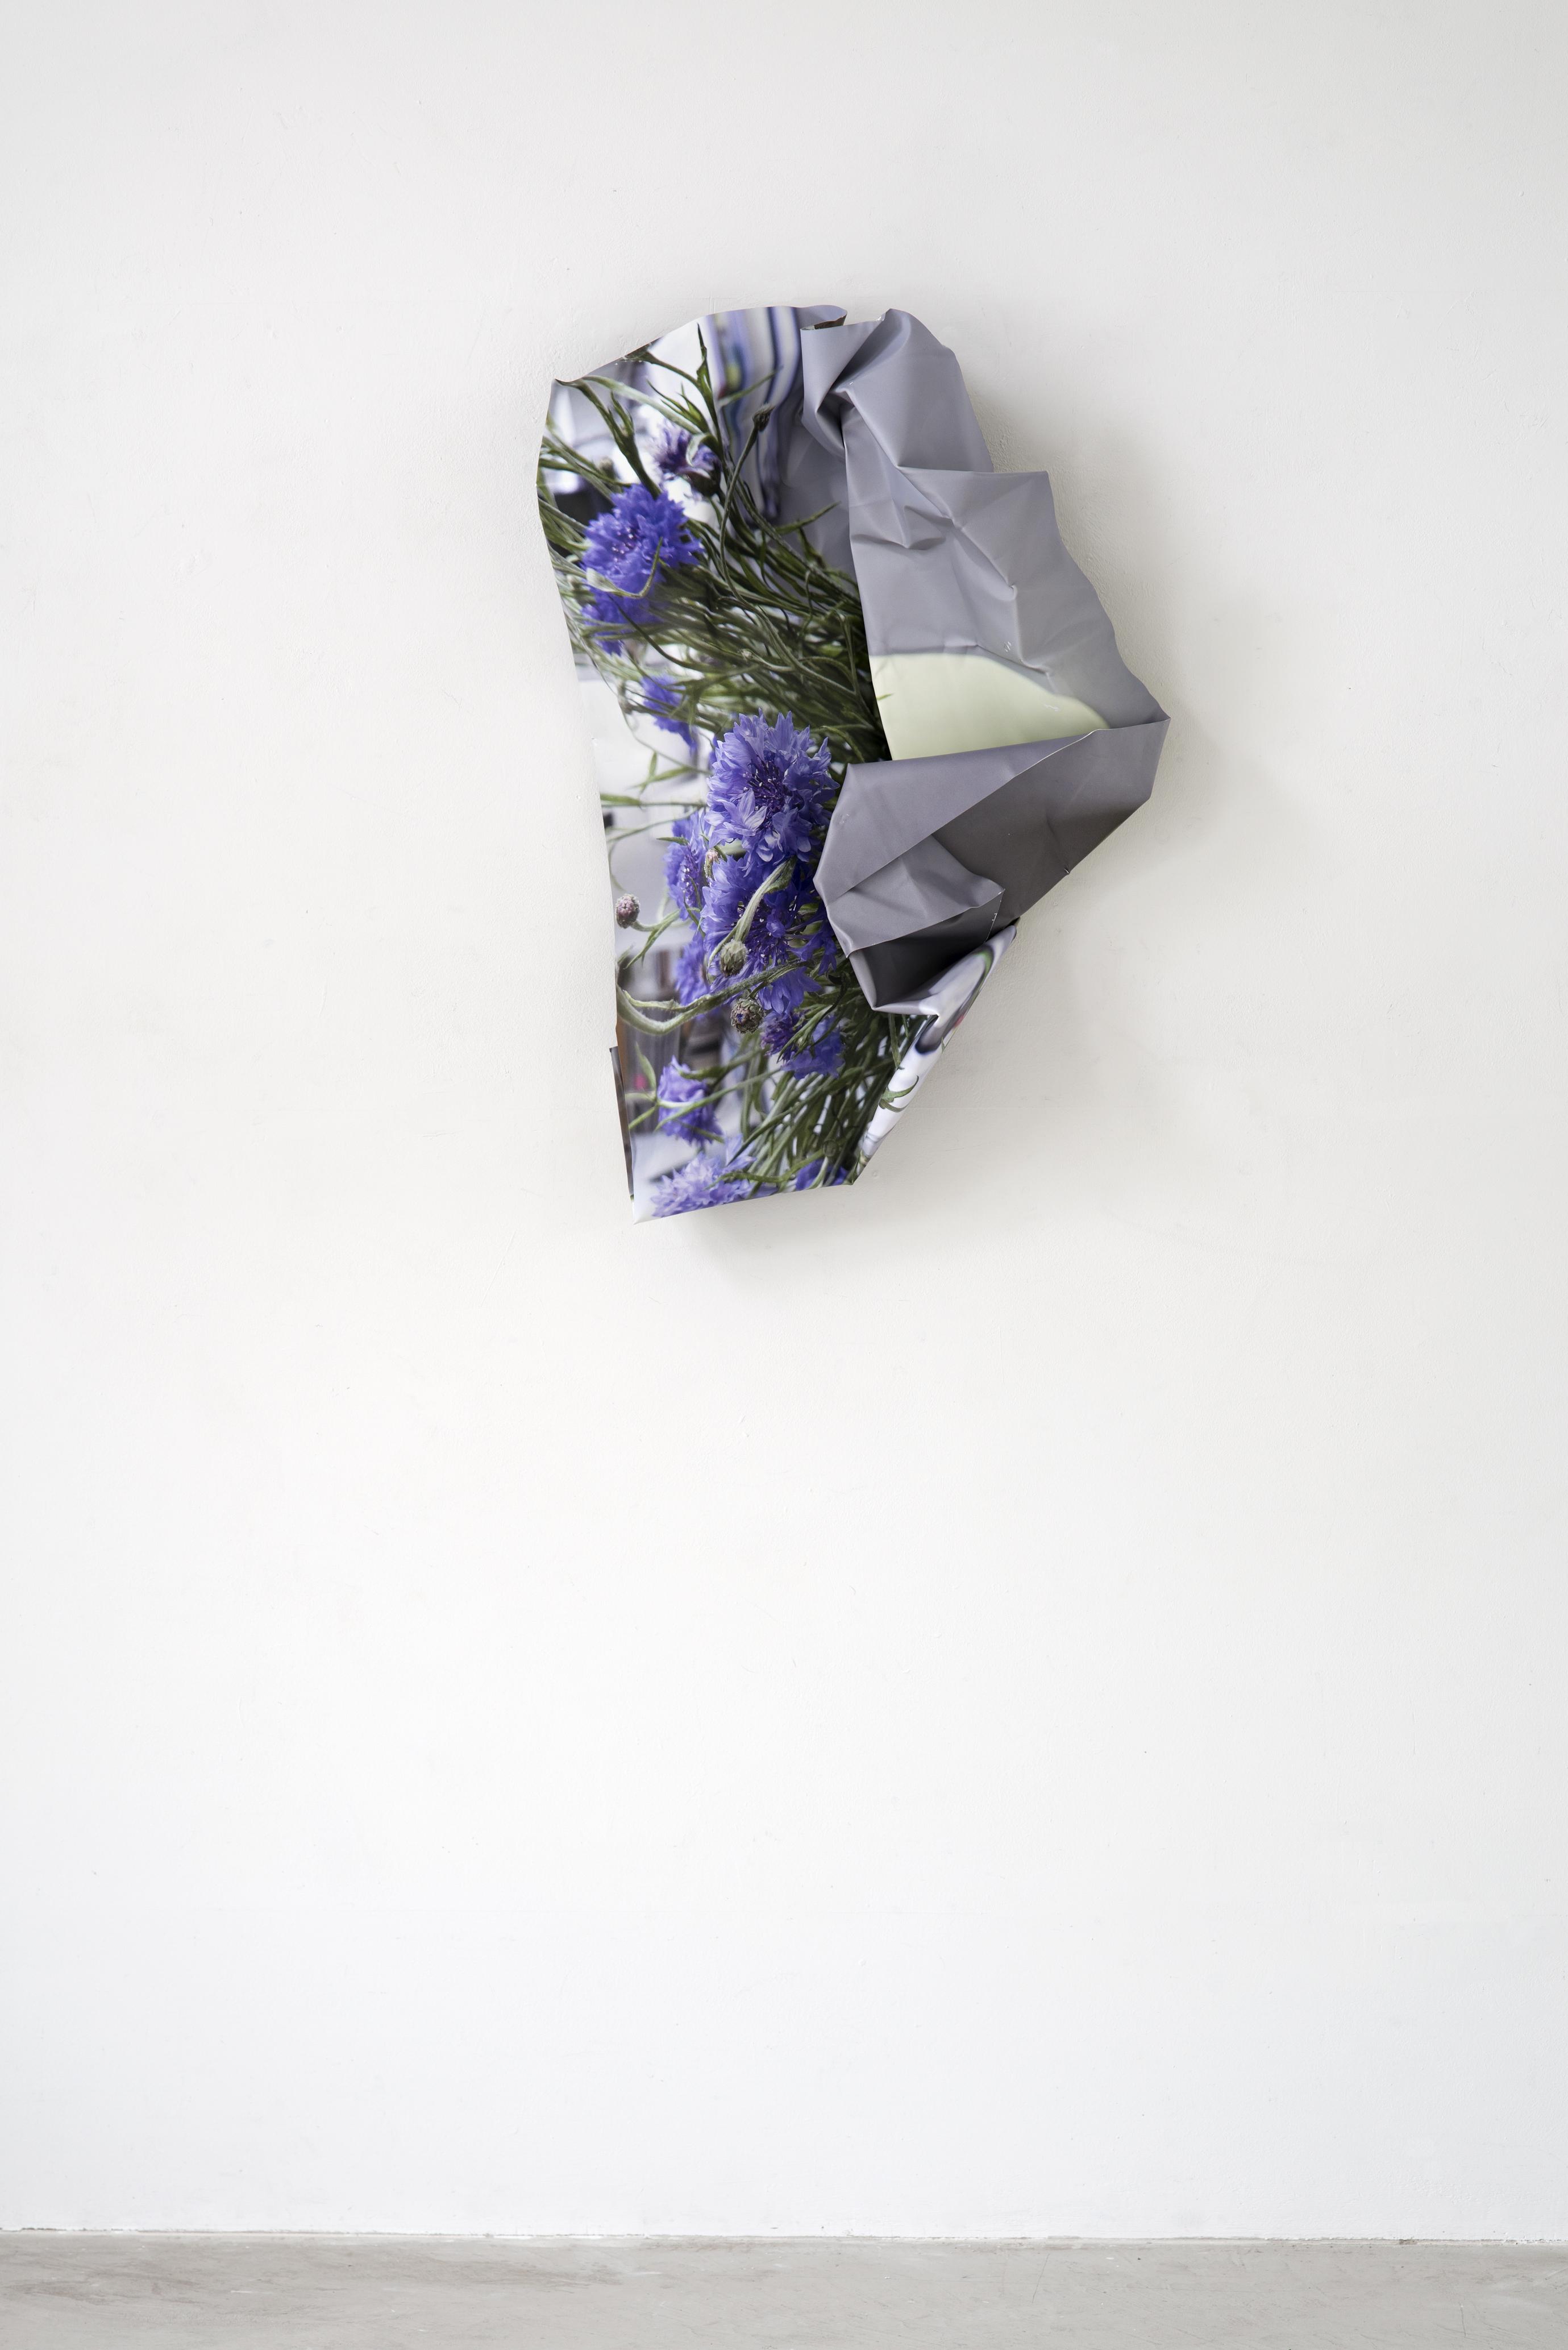 <i>Kornblumen</i>, 2020<br />aluminium, stainless steel, digital print, 106 x 71 x 30 cm<br />